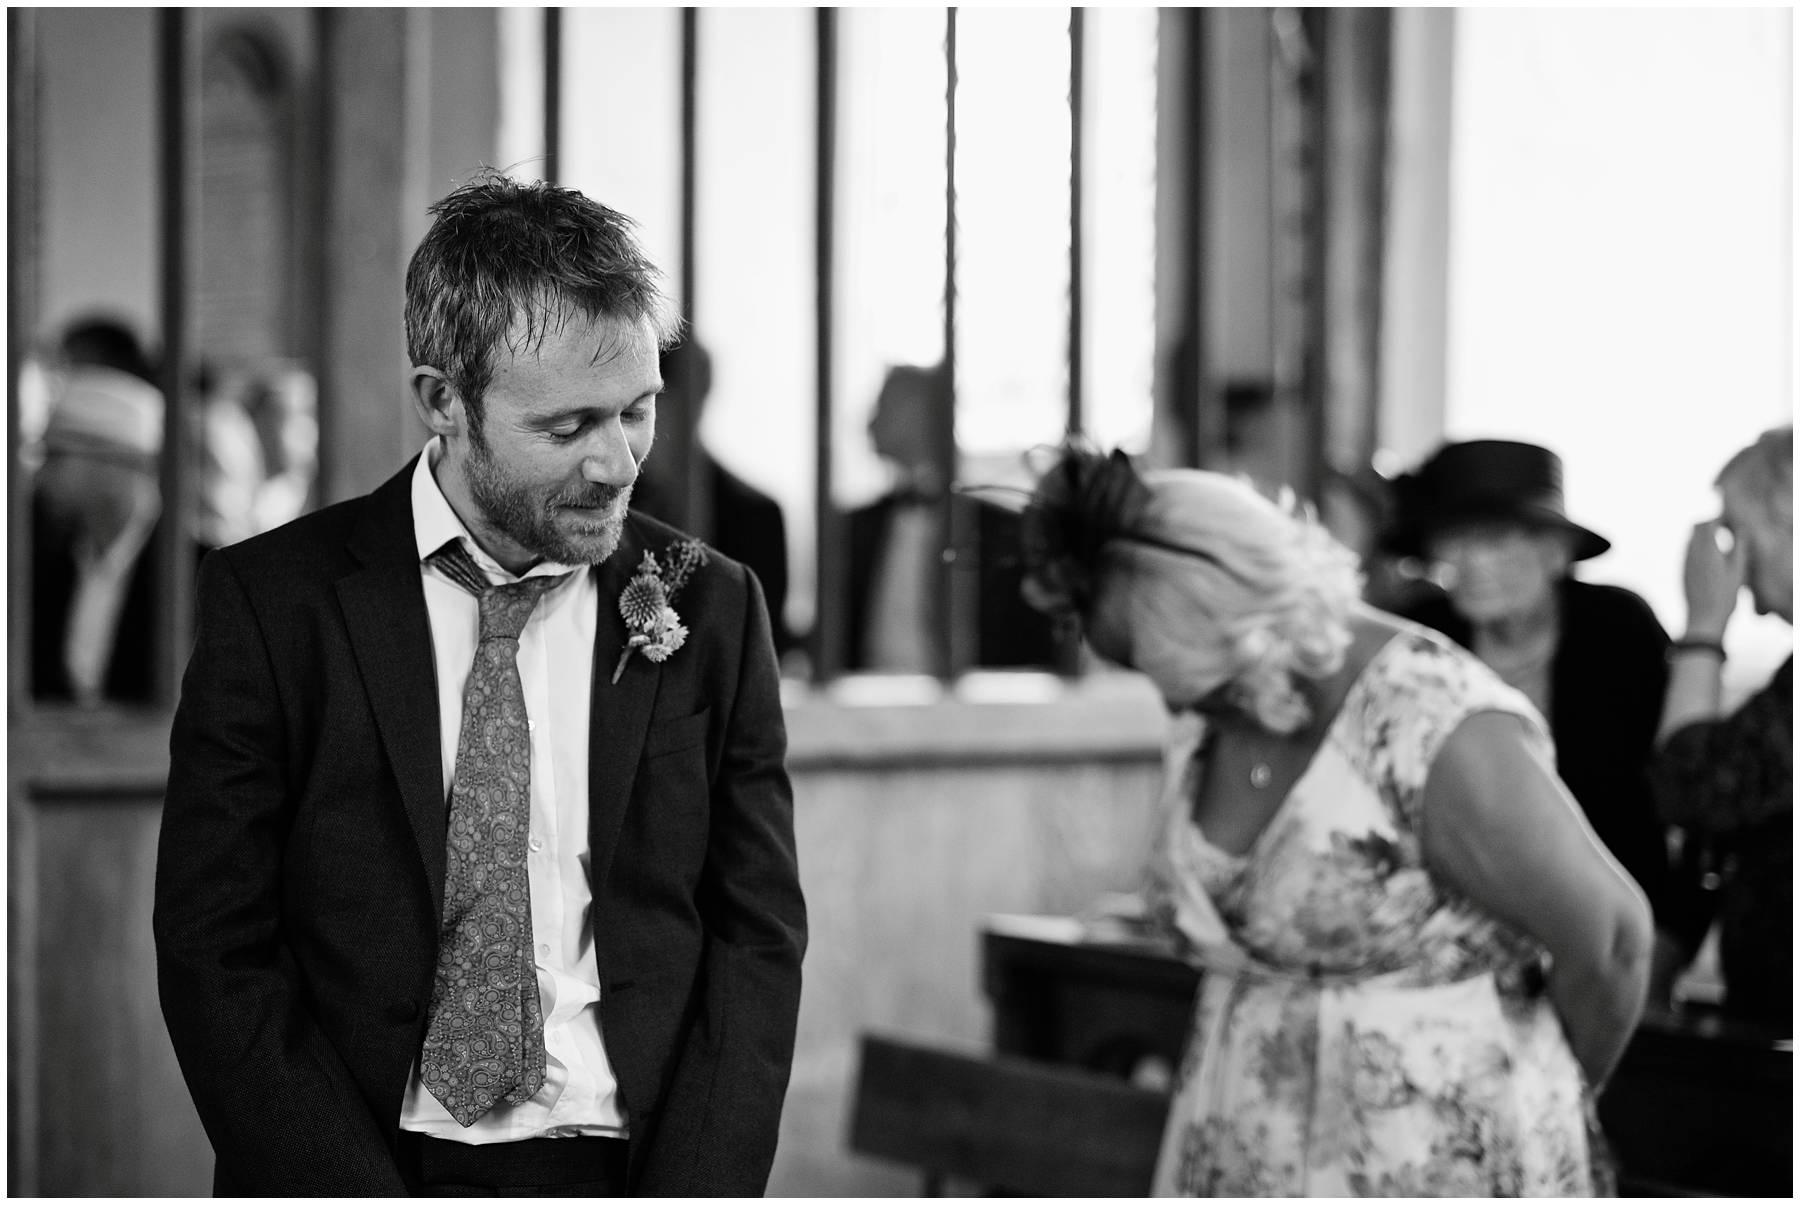 Nervous groom at church wedding in Essex